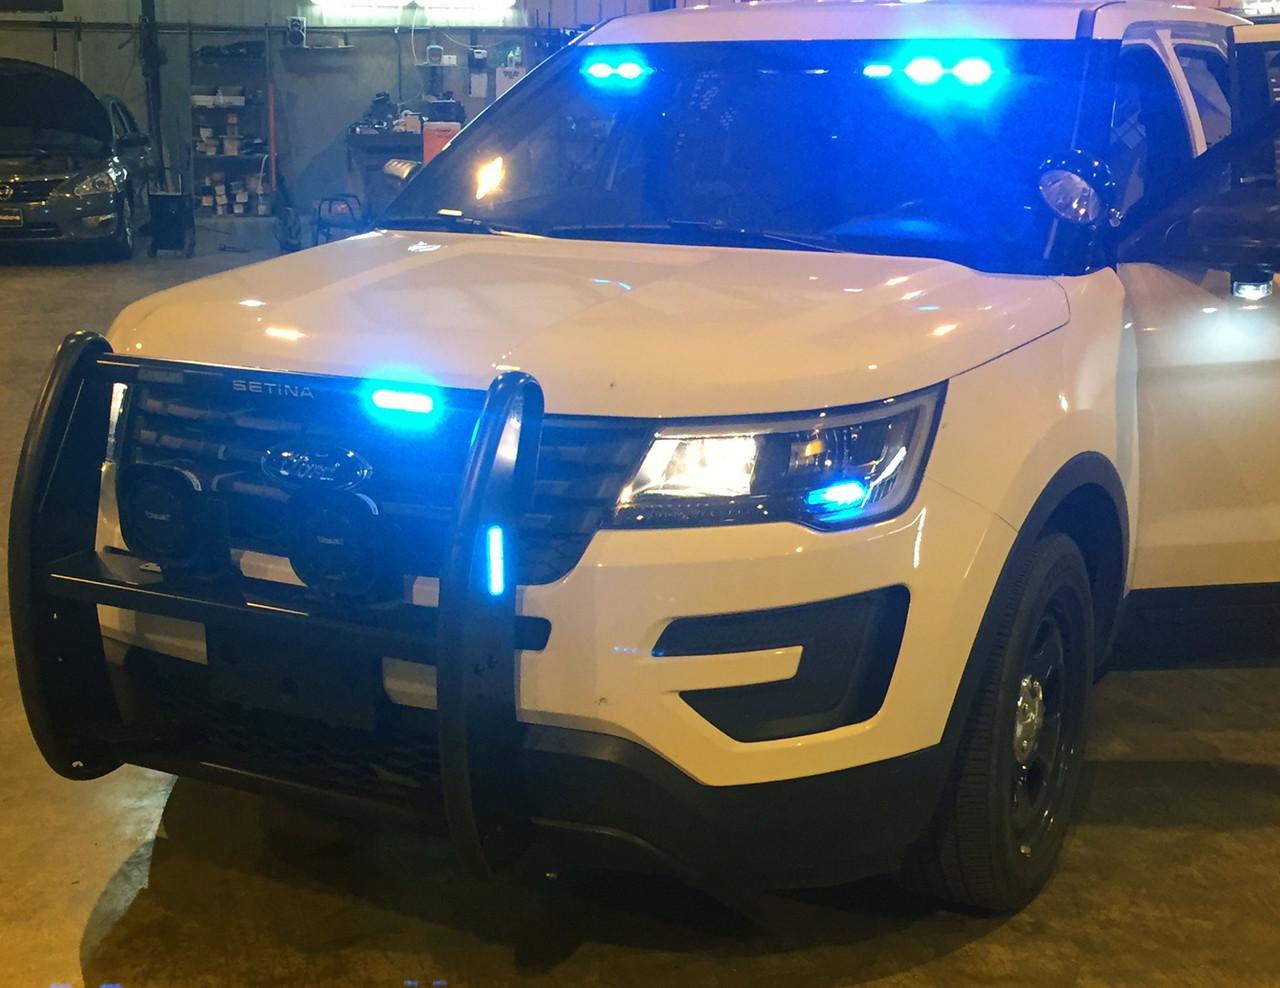 Setina LED Push Bumper PB-450-L Grill Guard for Police Cars SUVs Trucks and Vans